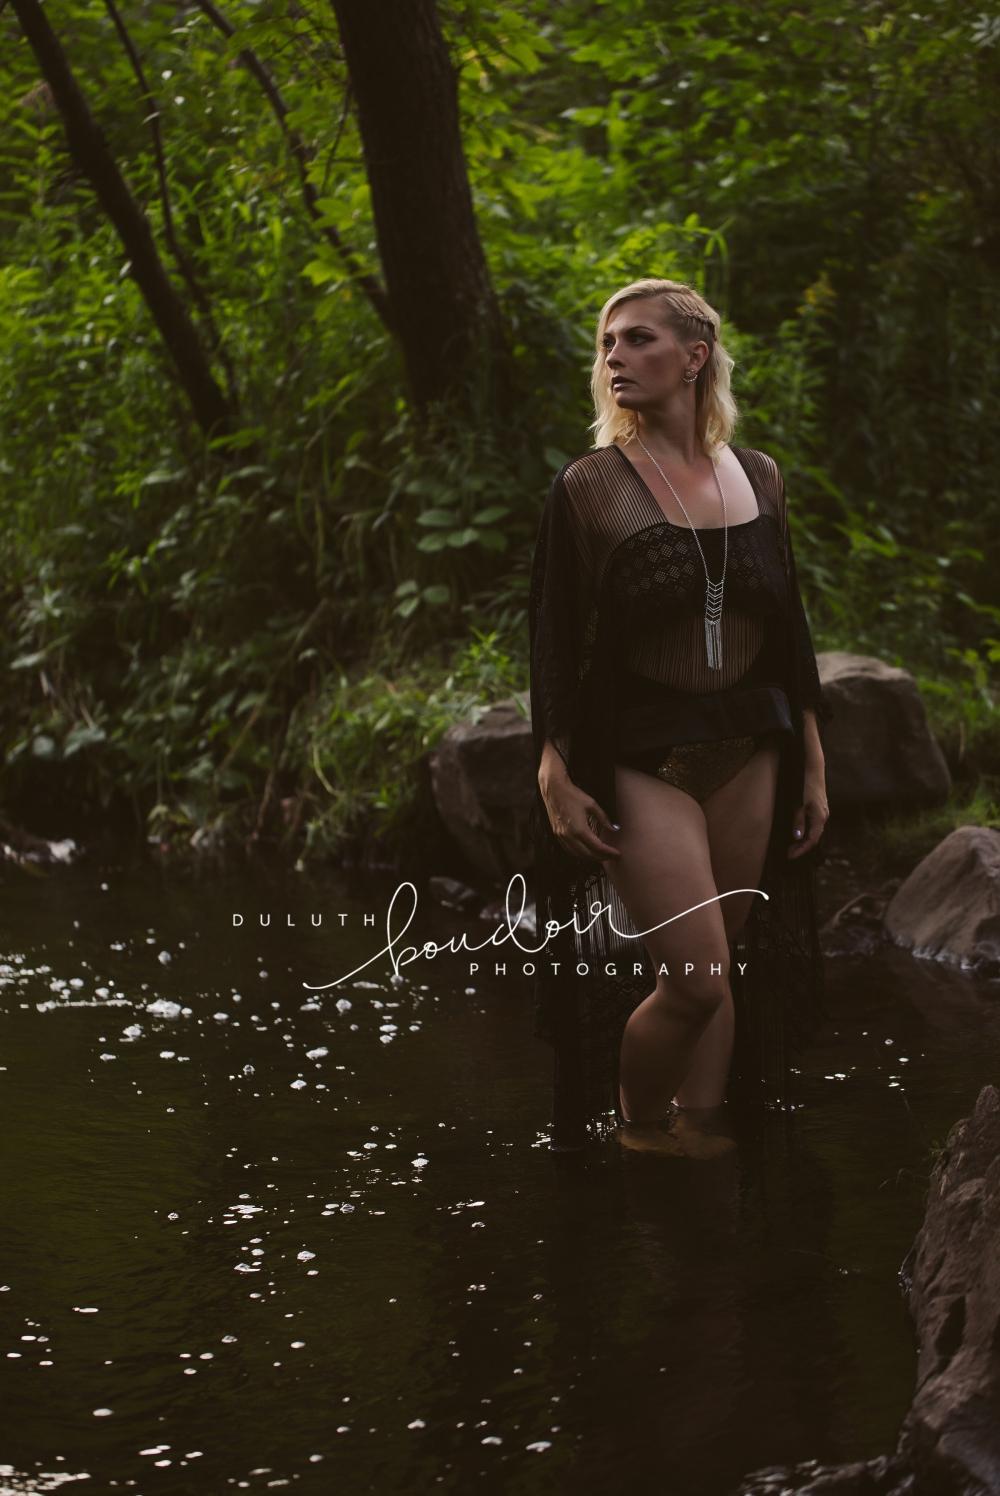 duluth-boudoir-photography-andrea-17